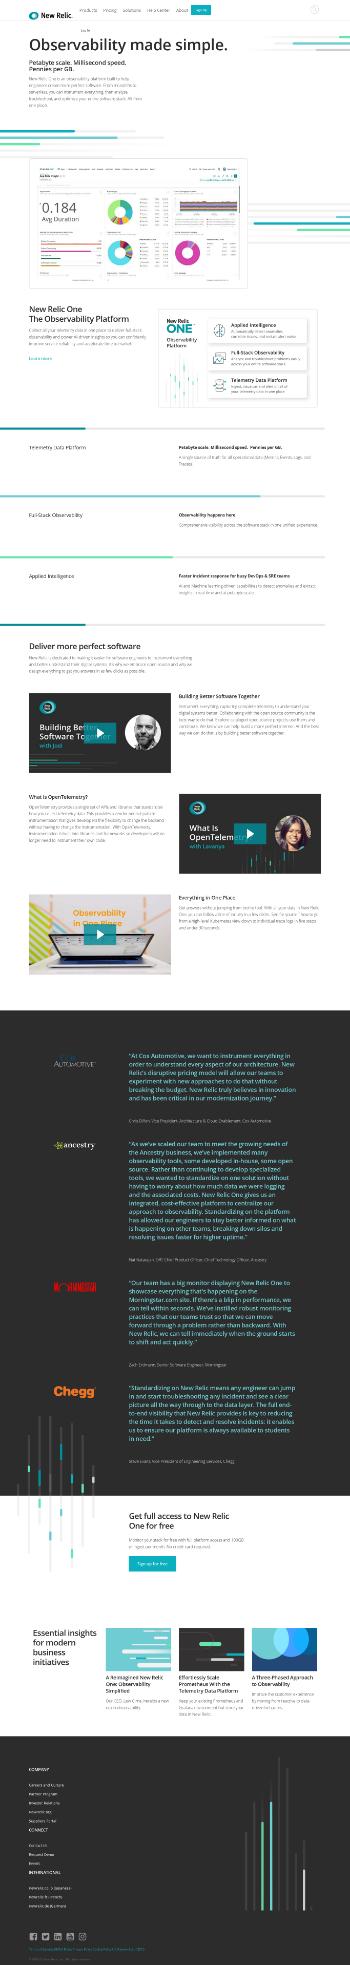 New Relic, Inc. Website Screenshot